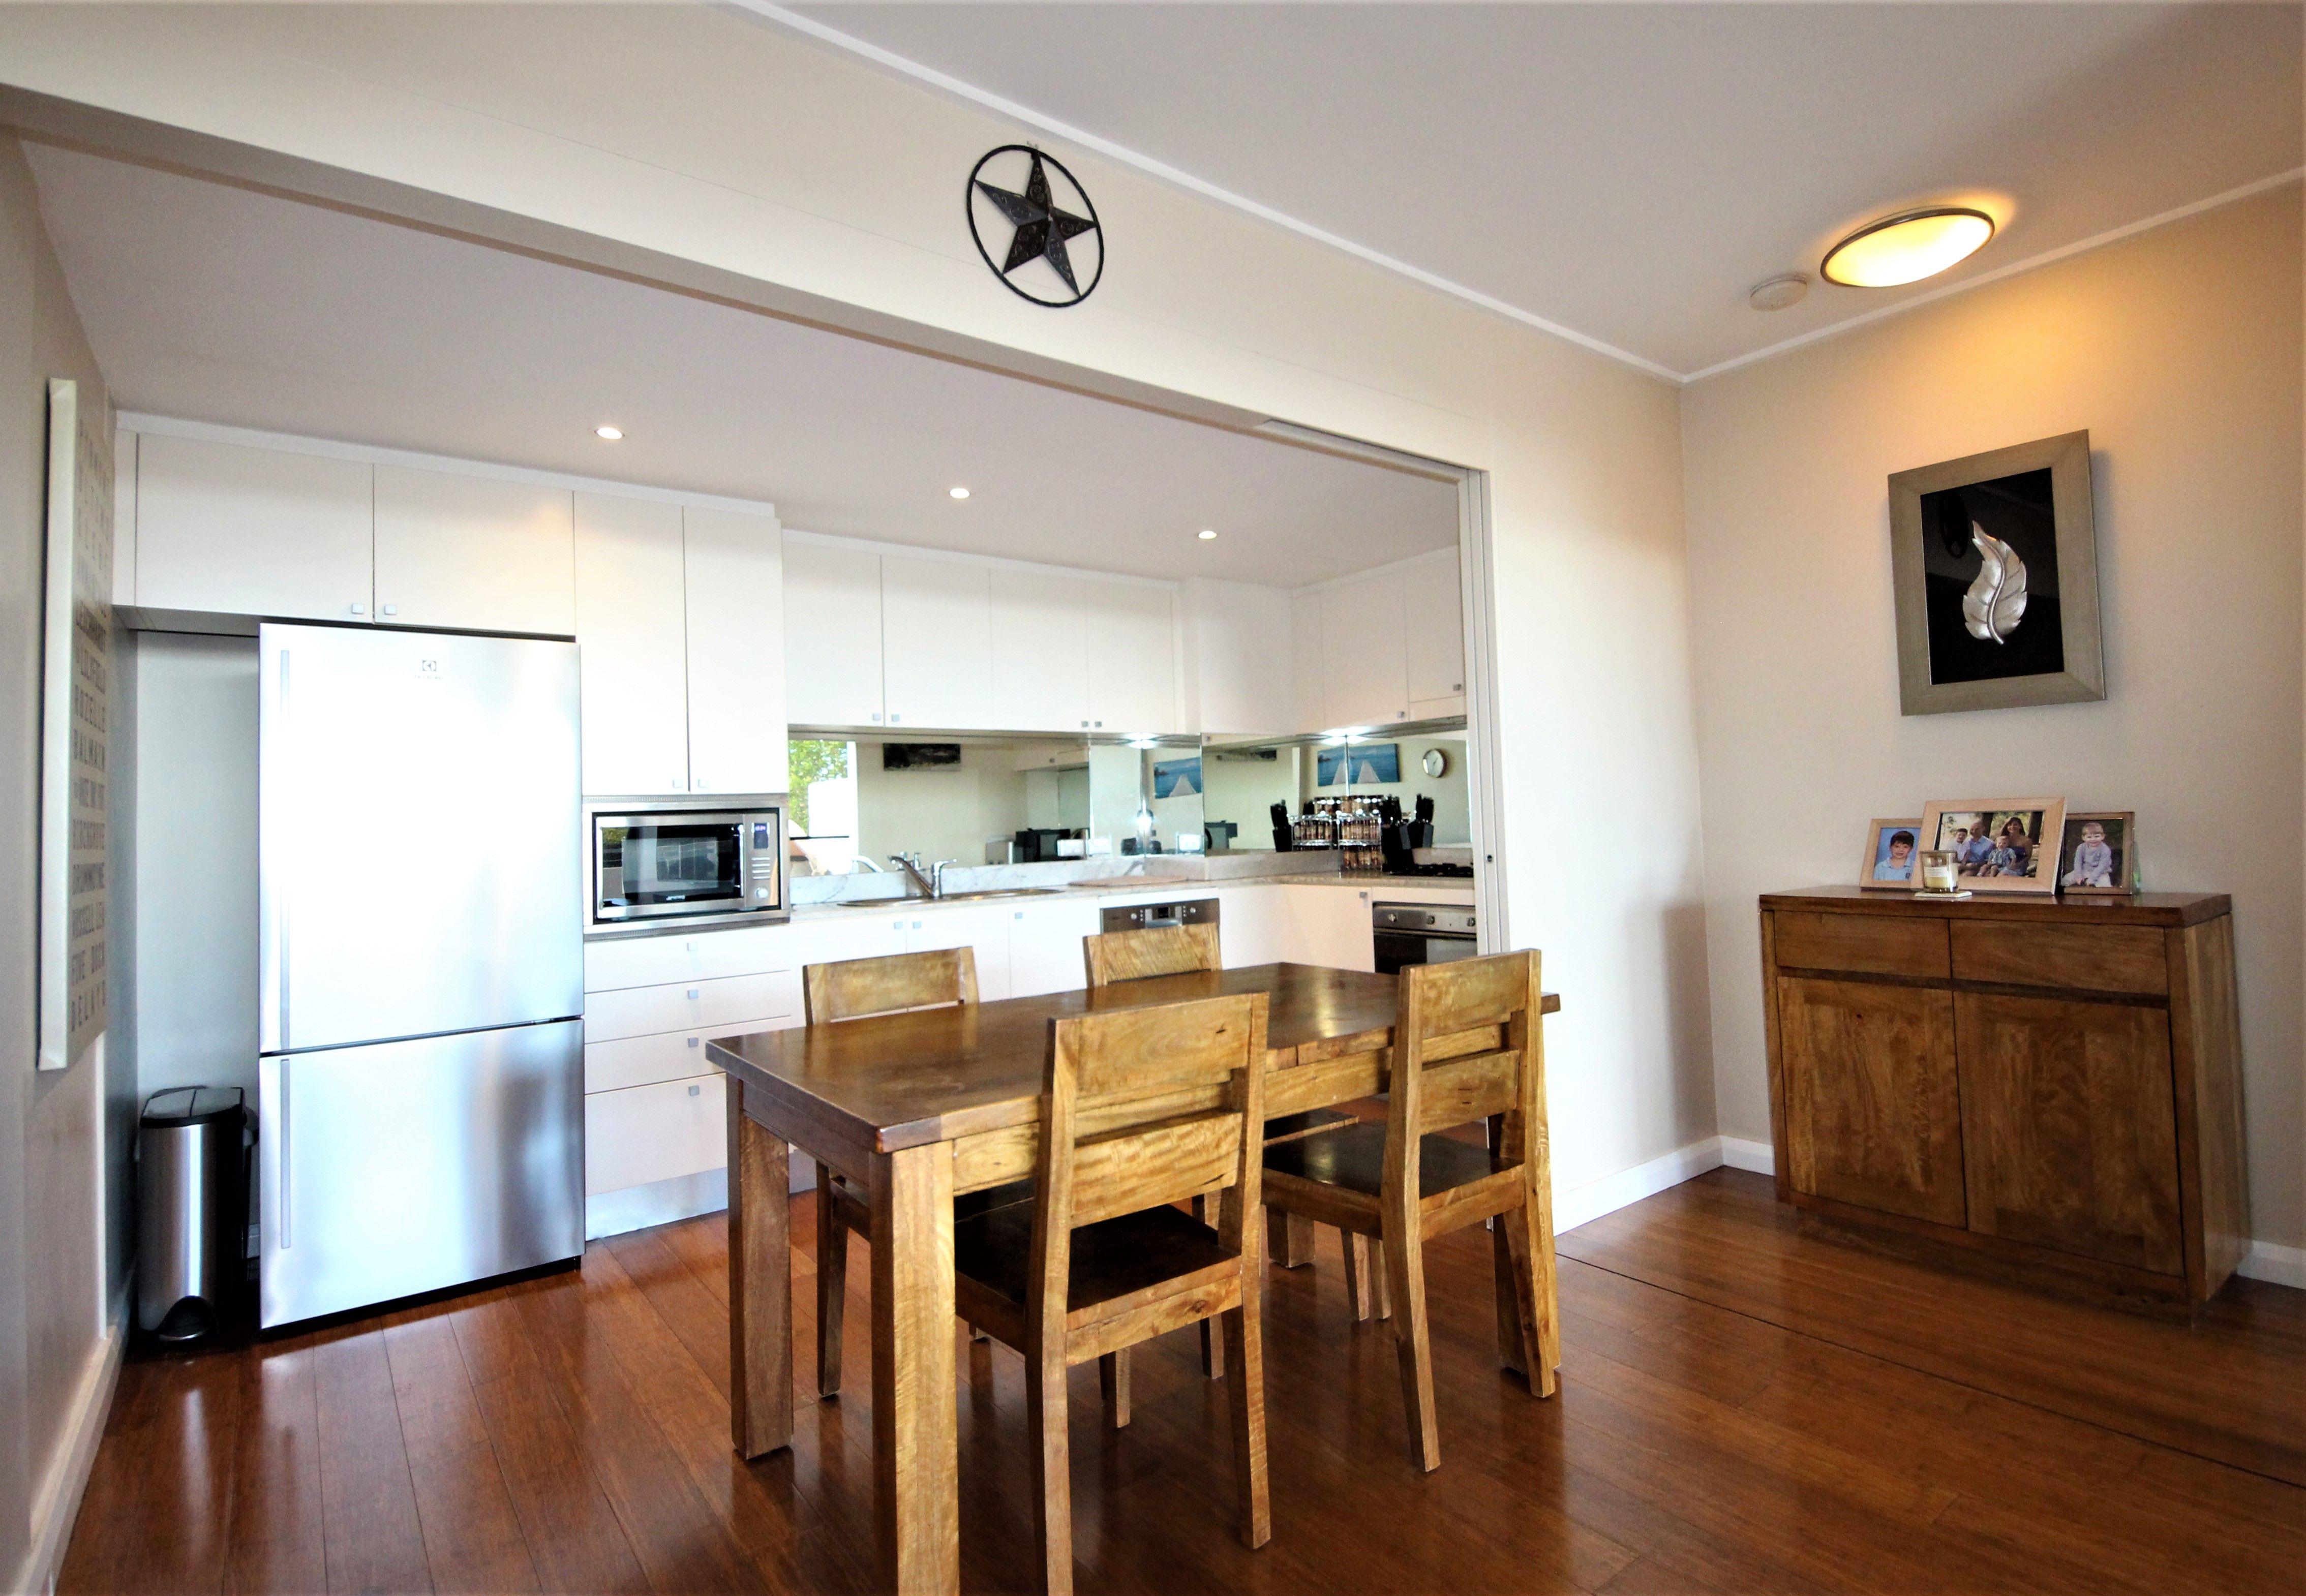 M03/4-12 Garfield Street, Five Dock NSW 2046